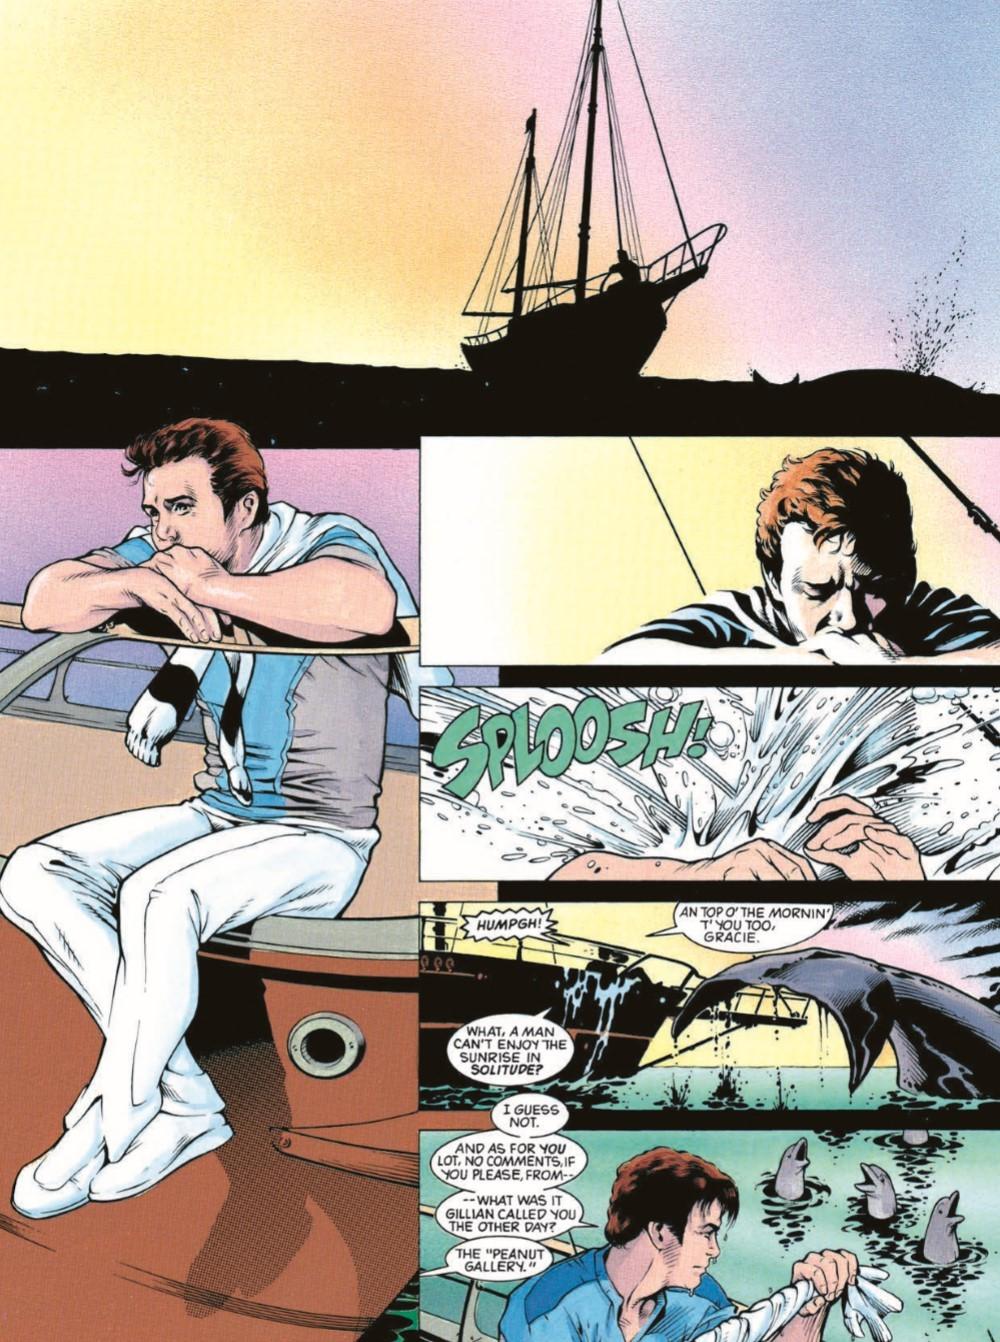 StarTrek_DebtofHonor-pr-7-1 ComicList Previews: STAR TREK DEBT OF HONOR CLASSIC EDITION GN